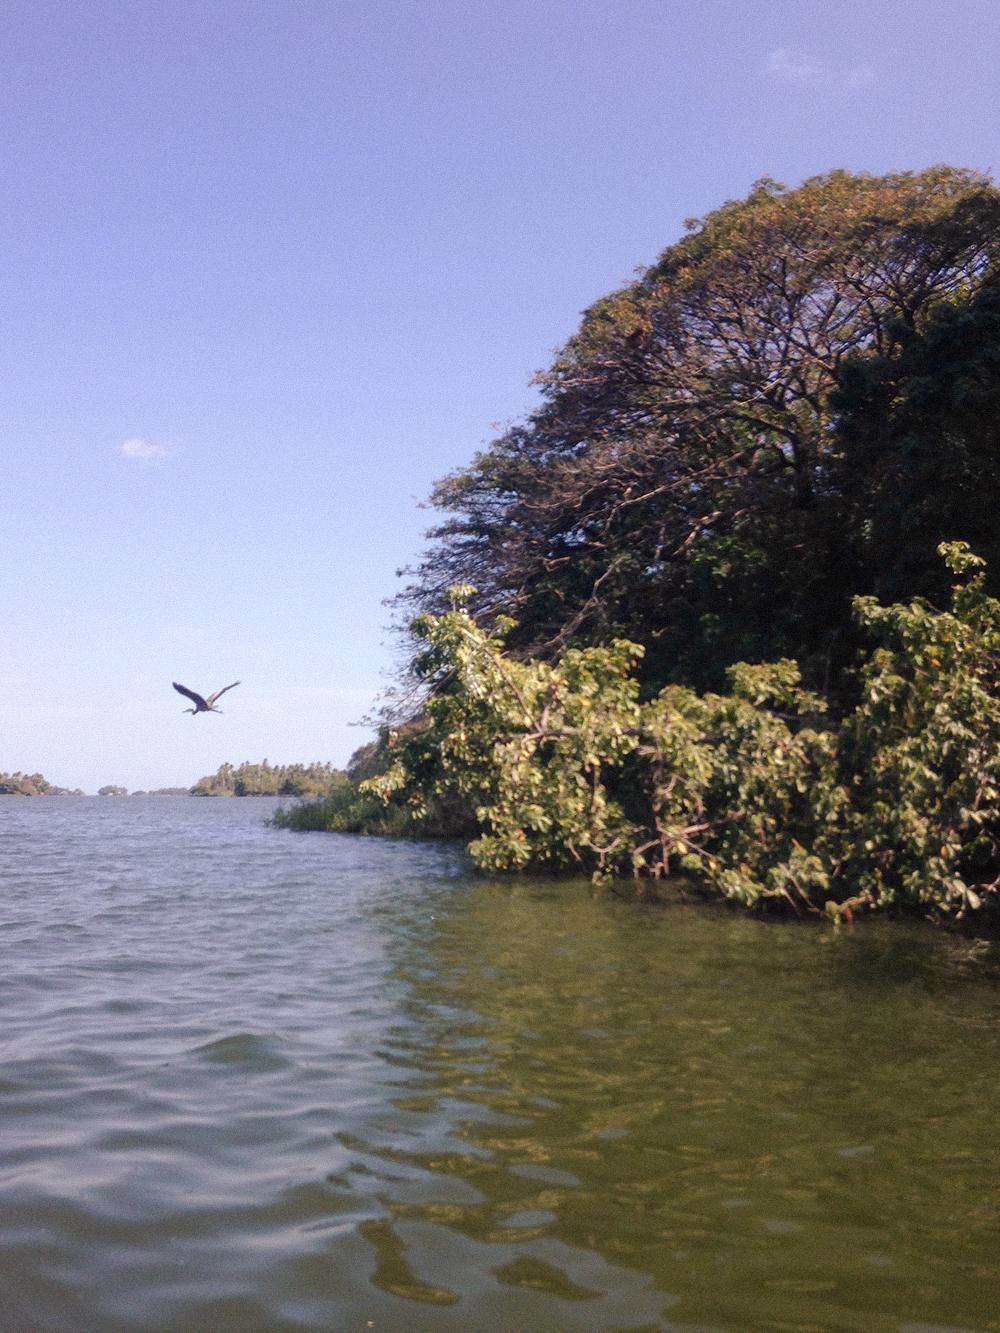 nicaragua, granada, granada nicaragua, lago nicaragua, lake nicaragua, isletas granada